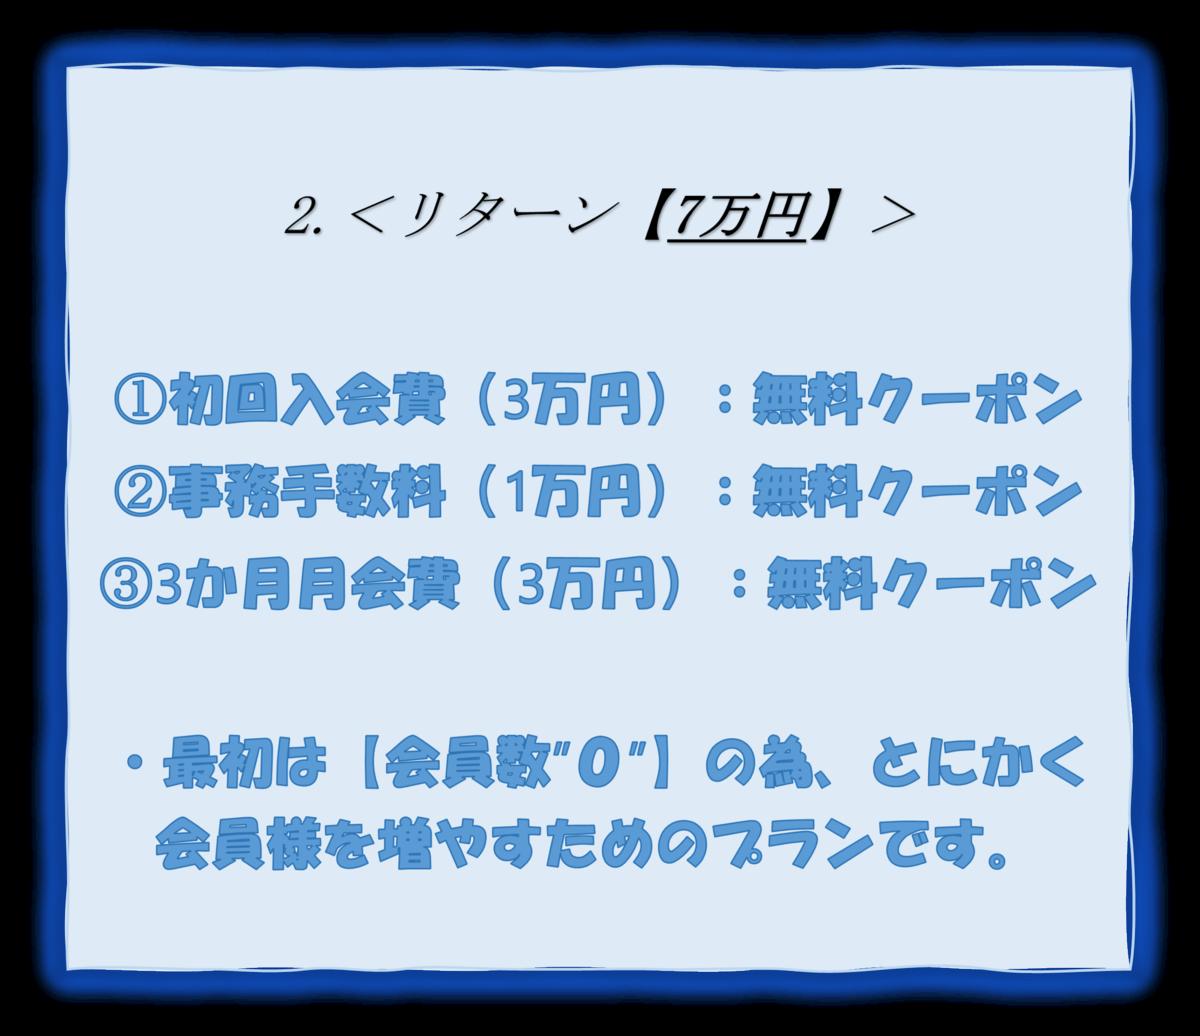 f:id:tsubasatyann:20210424110119p:plain